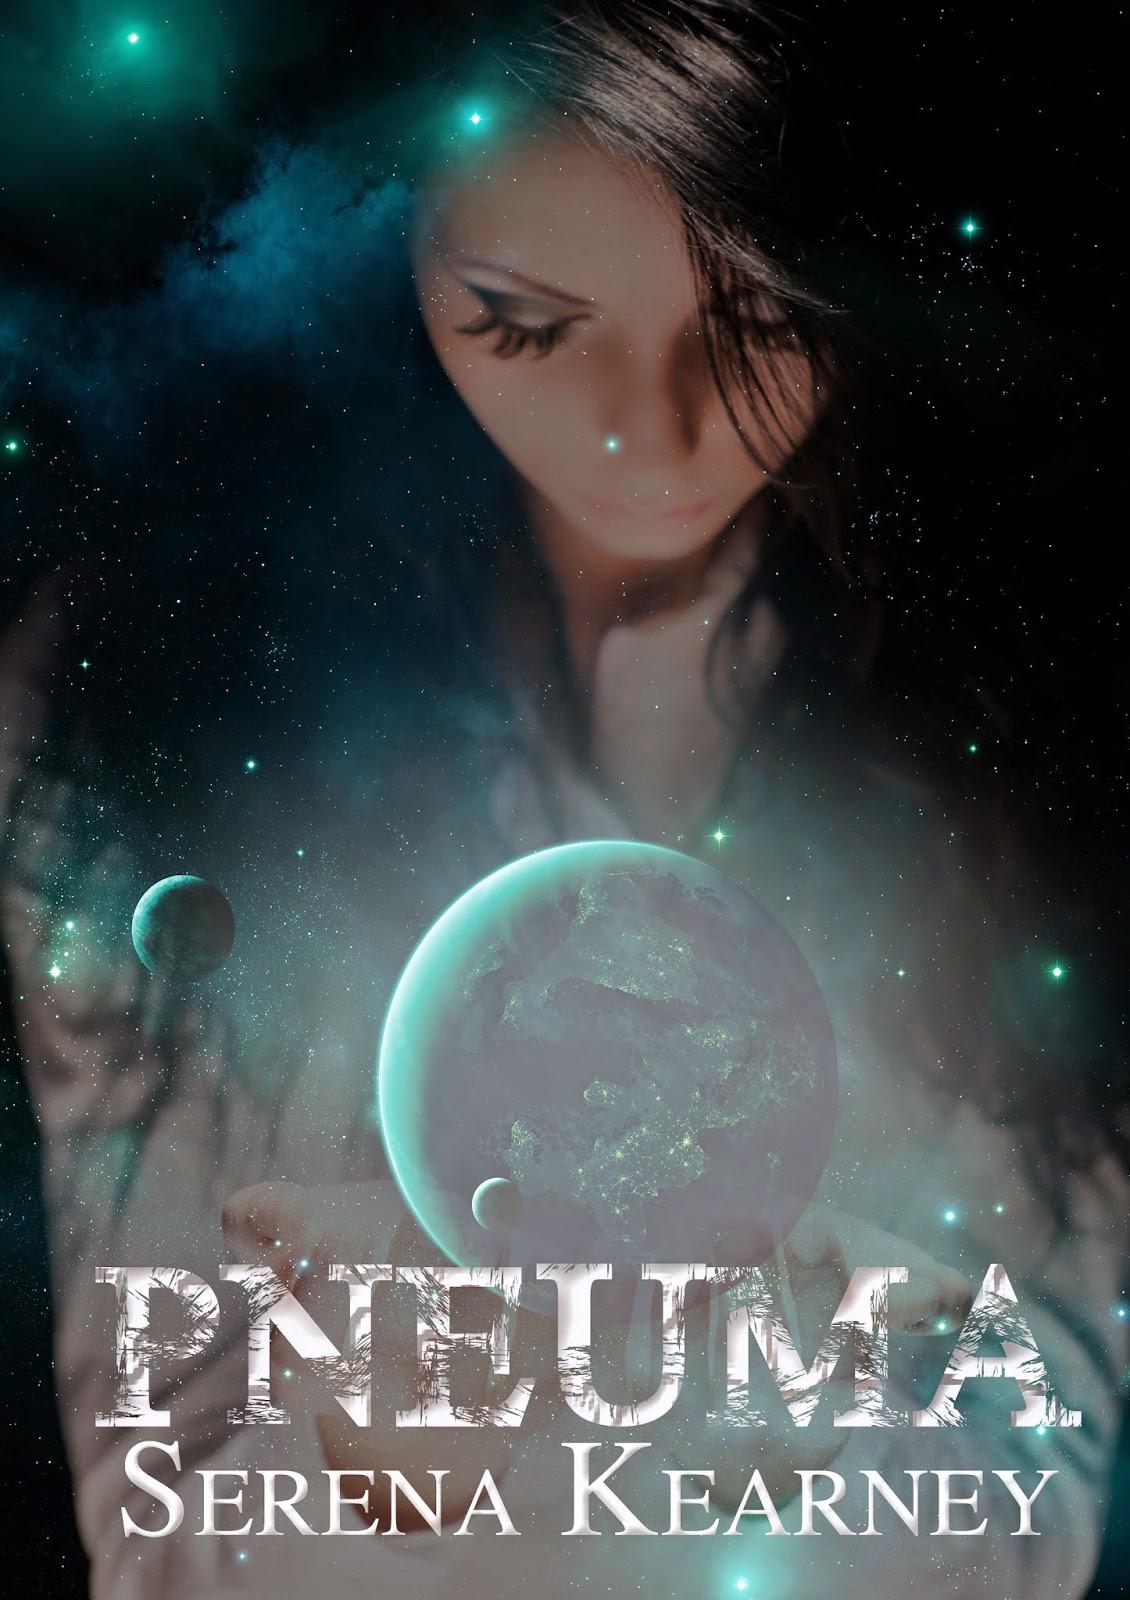 pneuma, serena kearney, young adult, YA, scifi, romance